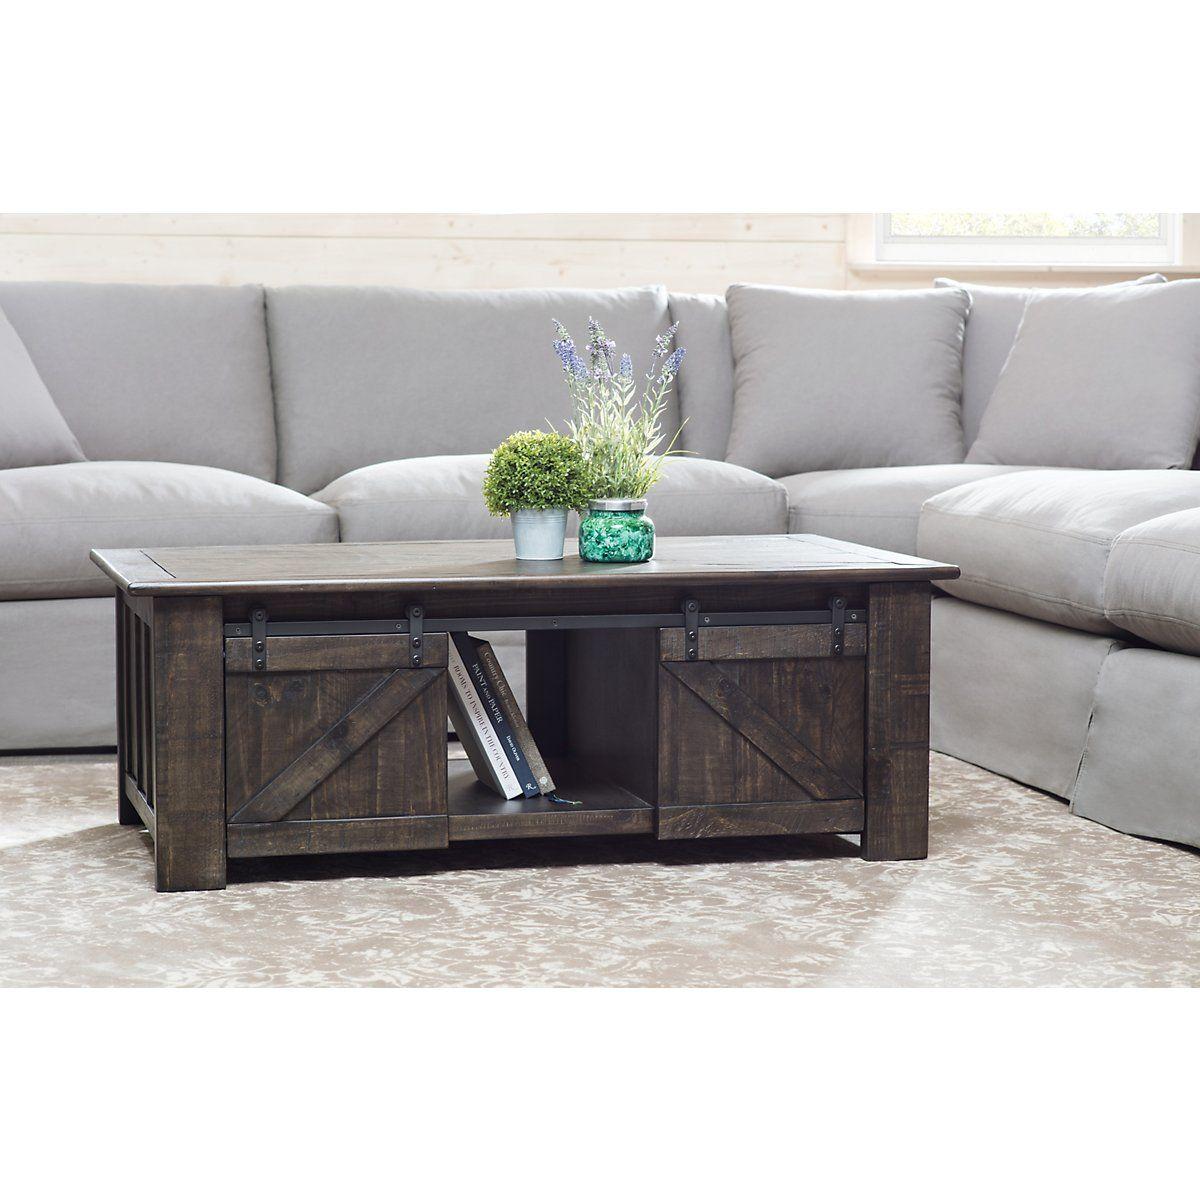 City Furniture Garrett Dark Tone Castored Lift Coffee Table